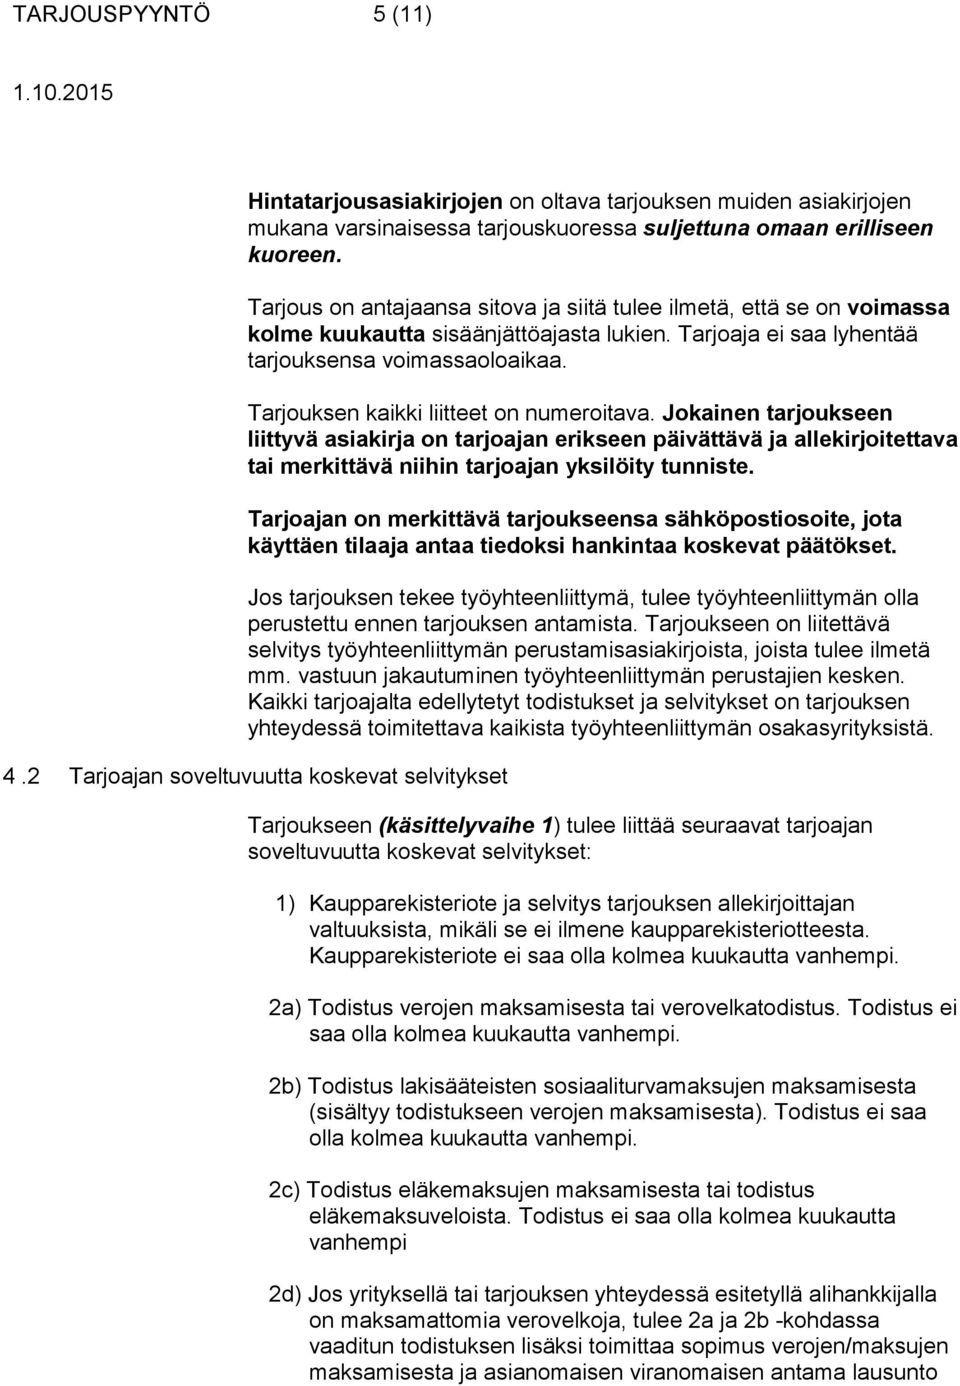 Permohonan Kerja Jurutera (With images) Lettering, Find